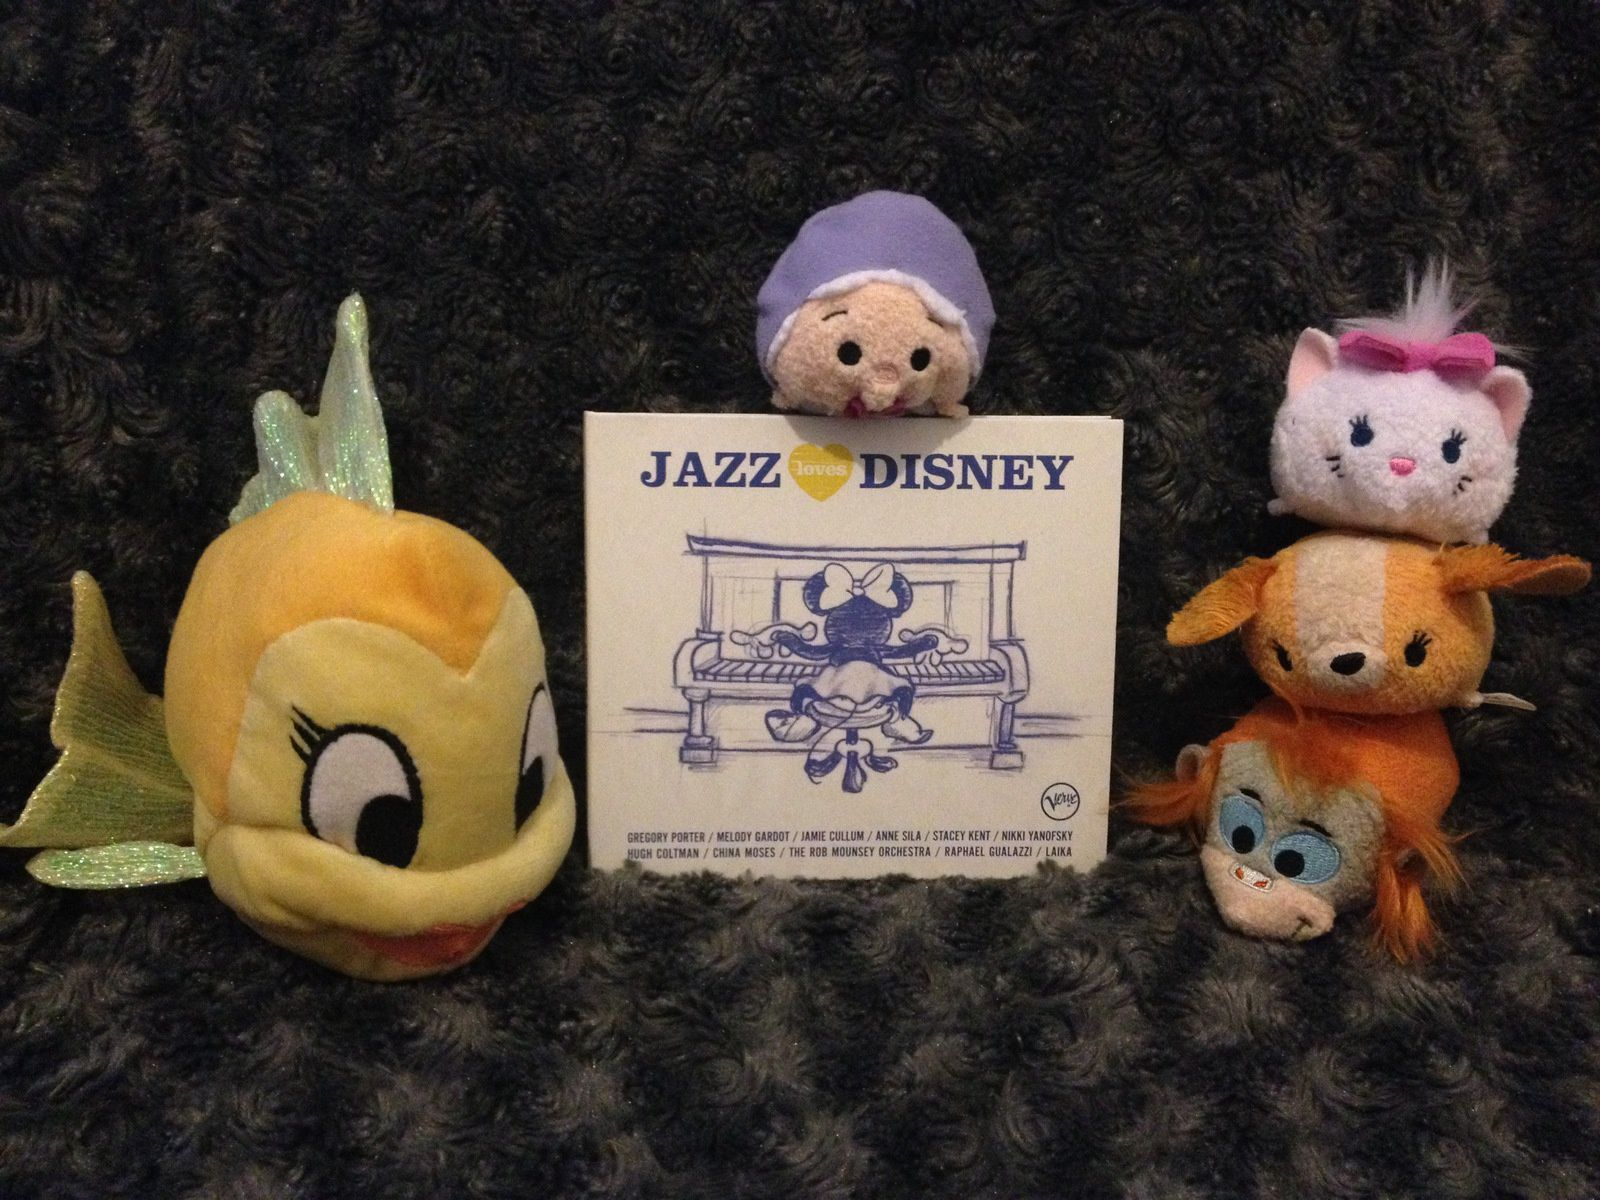 Disney en musique ! We Love Disney 3 et Jazz Loves Disney